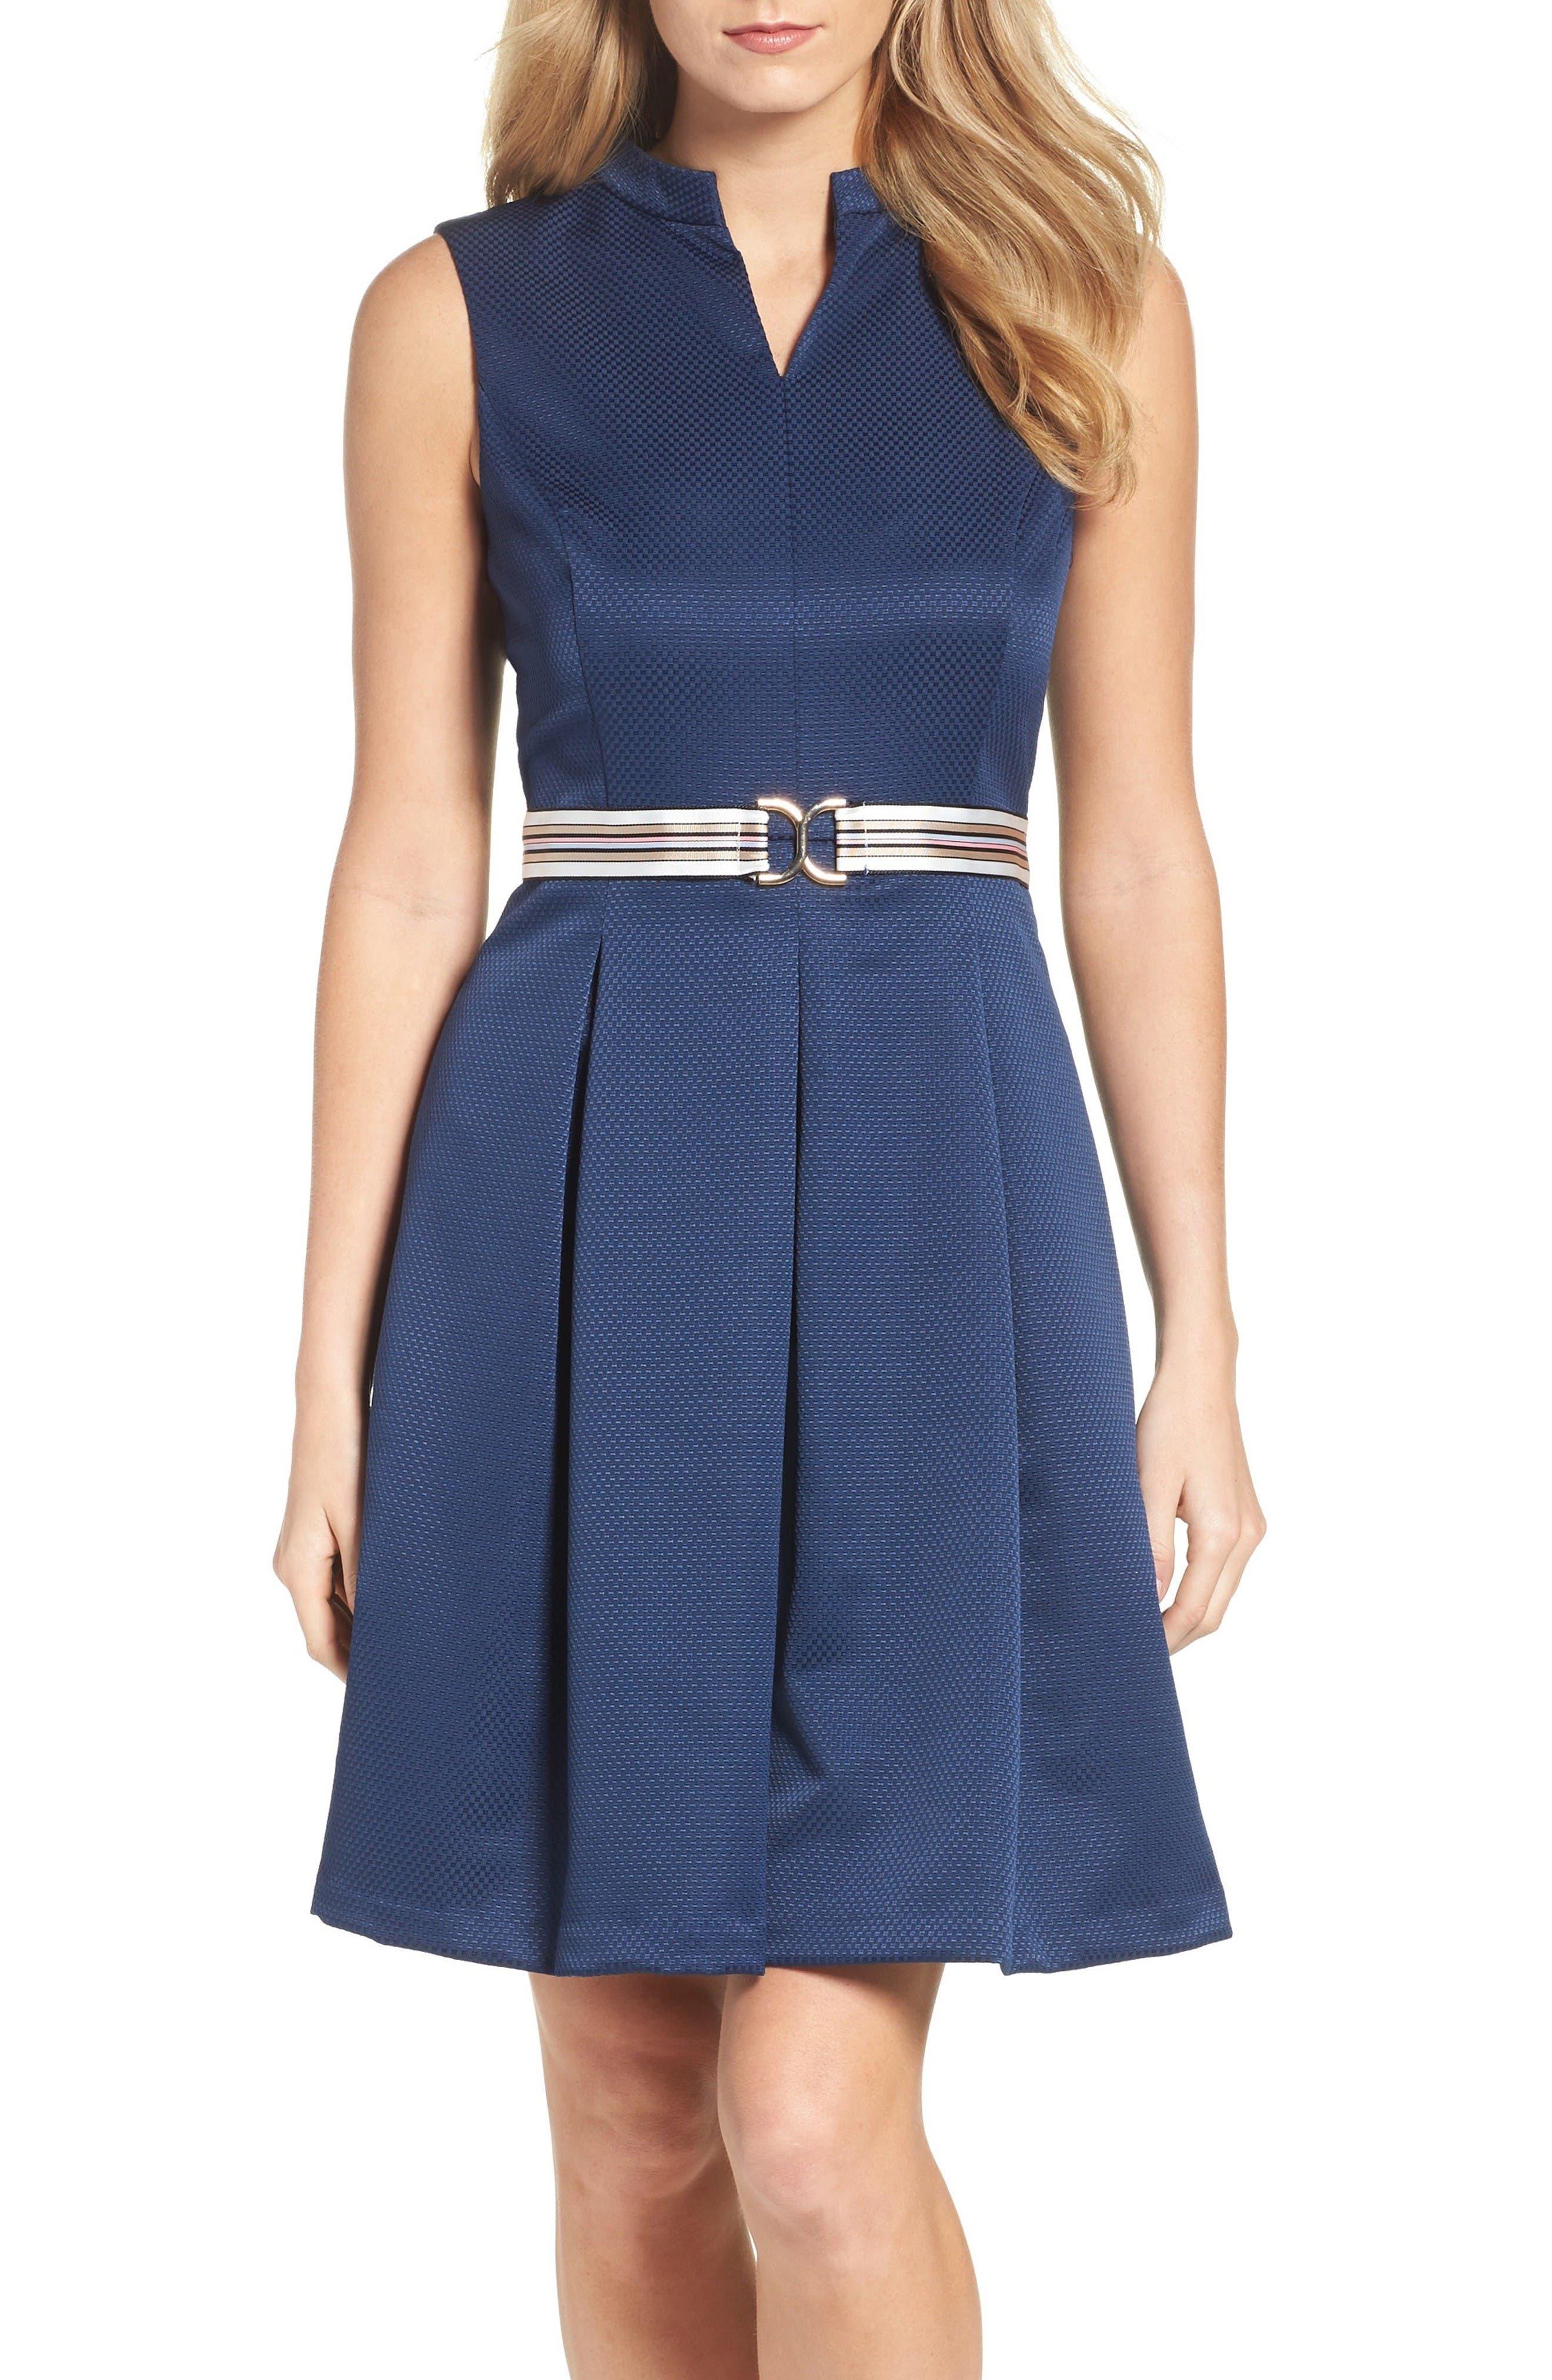 Alternate Image 1 Selected - Ellen Tracy Belted Fit & Flare Dress